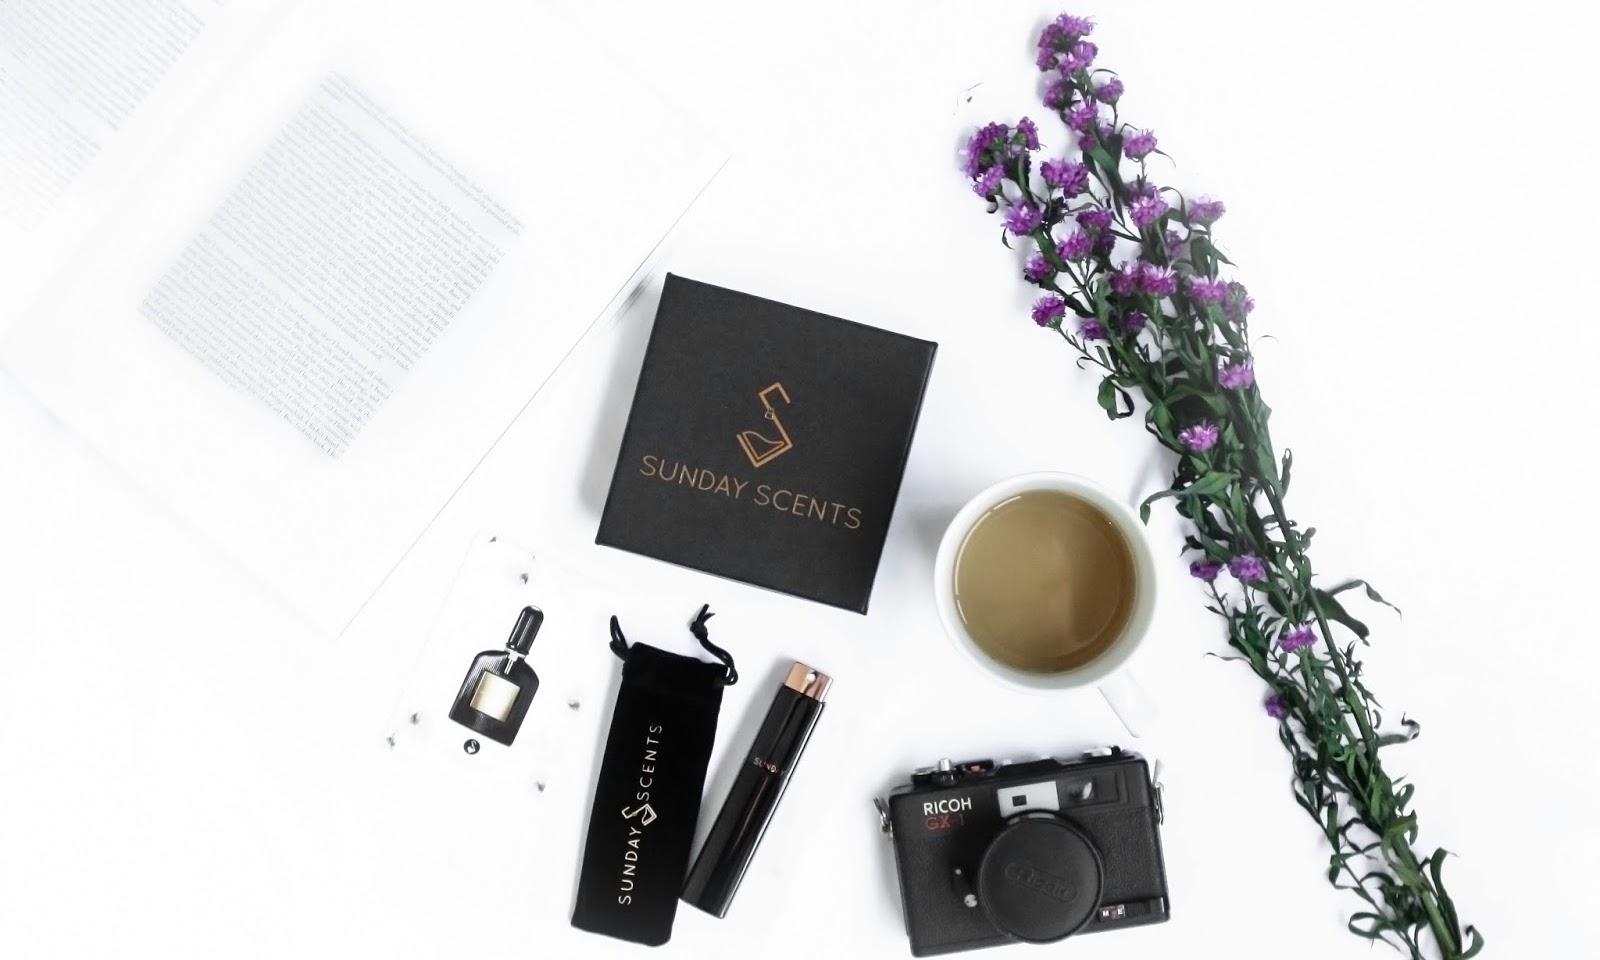 sunday scents perfume subscription